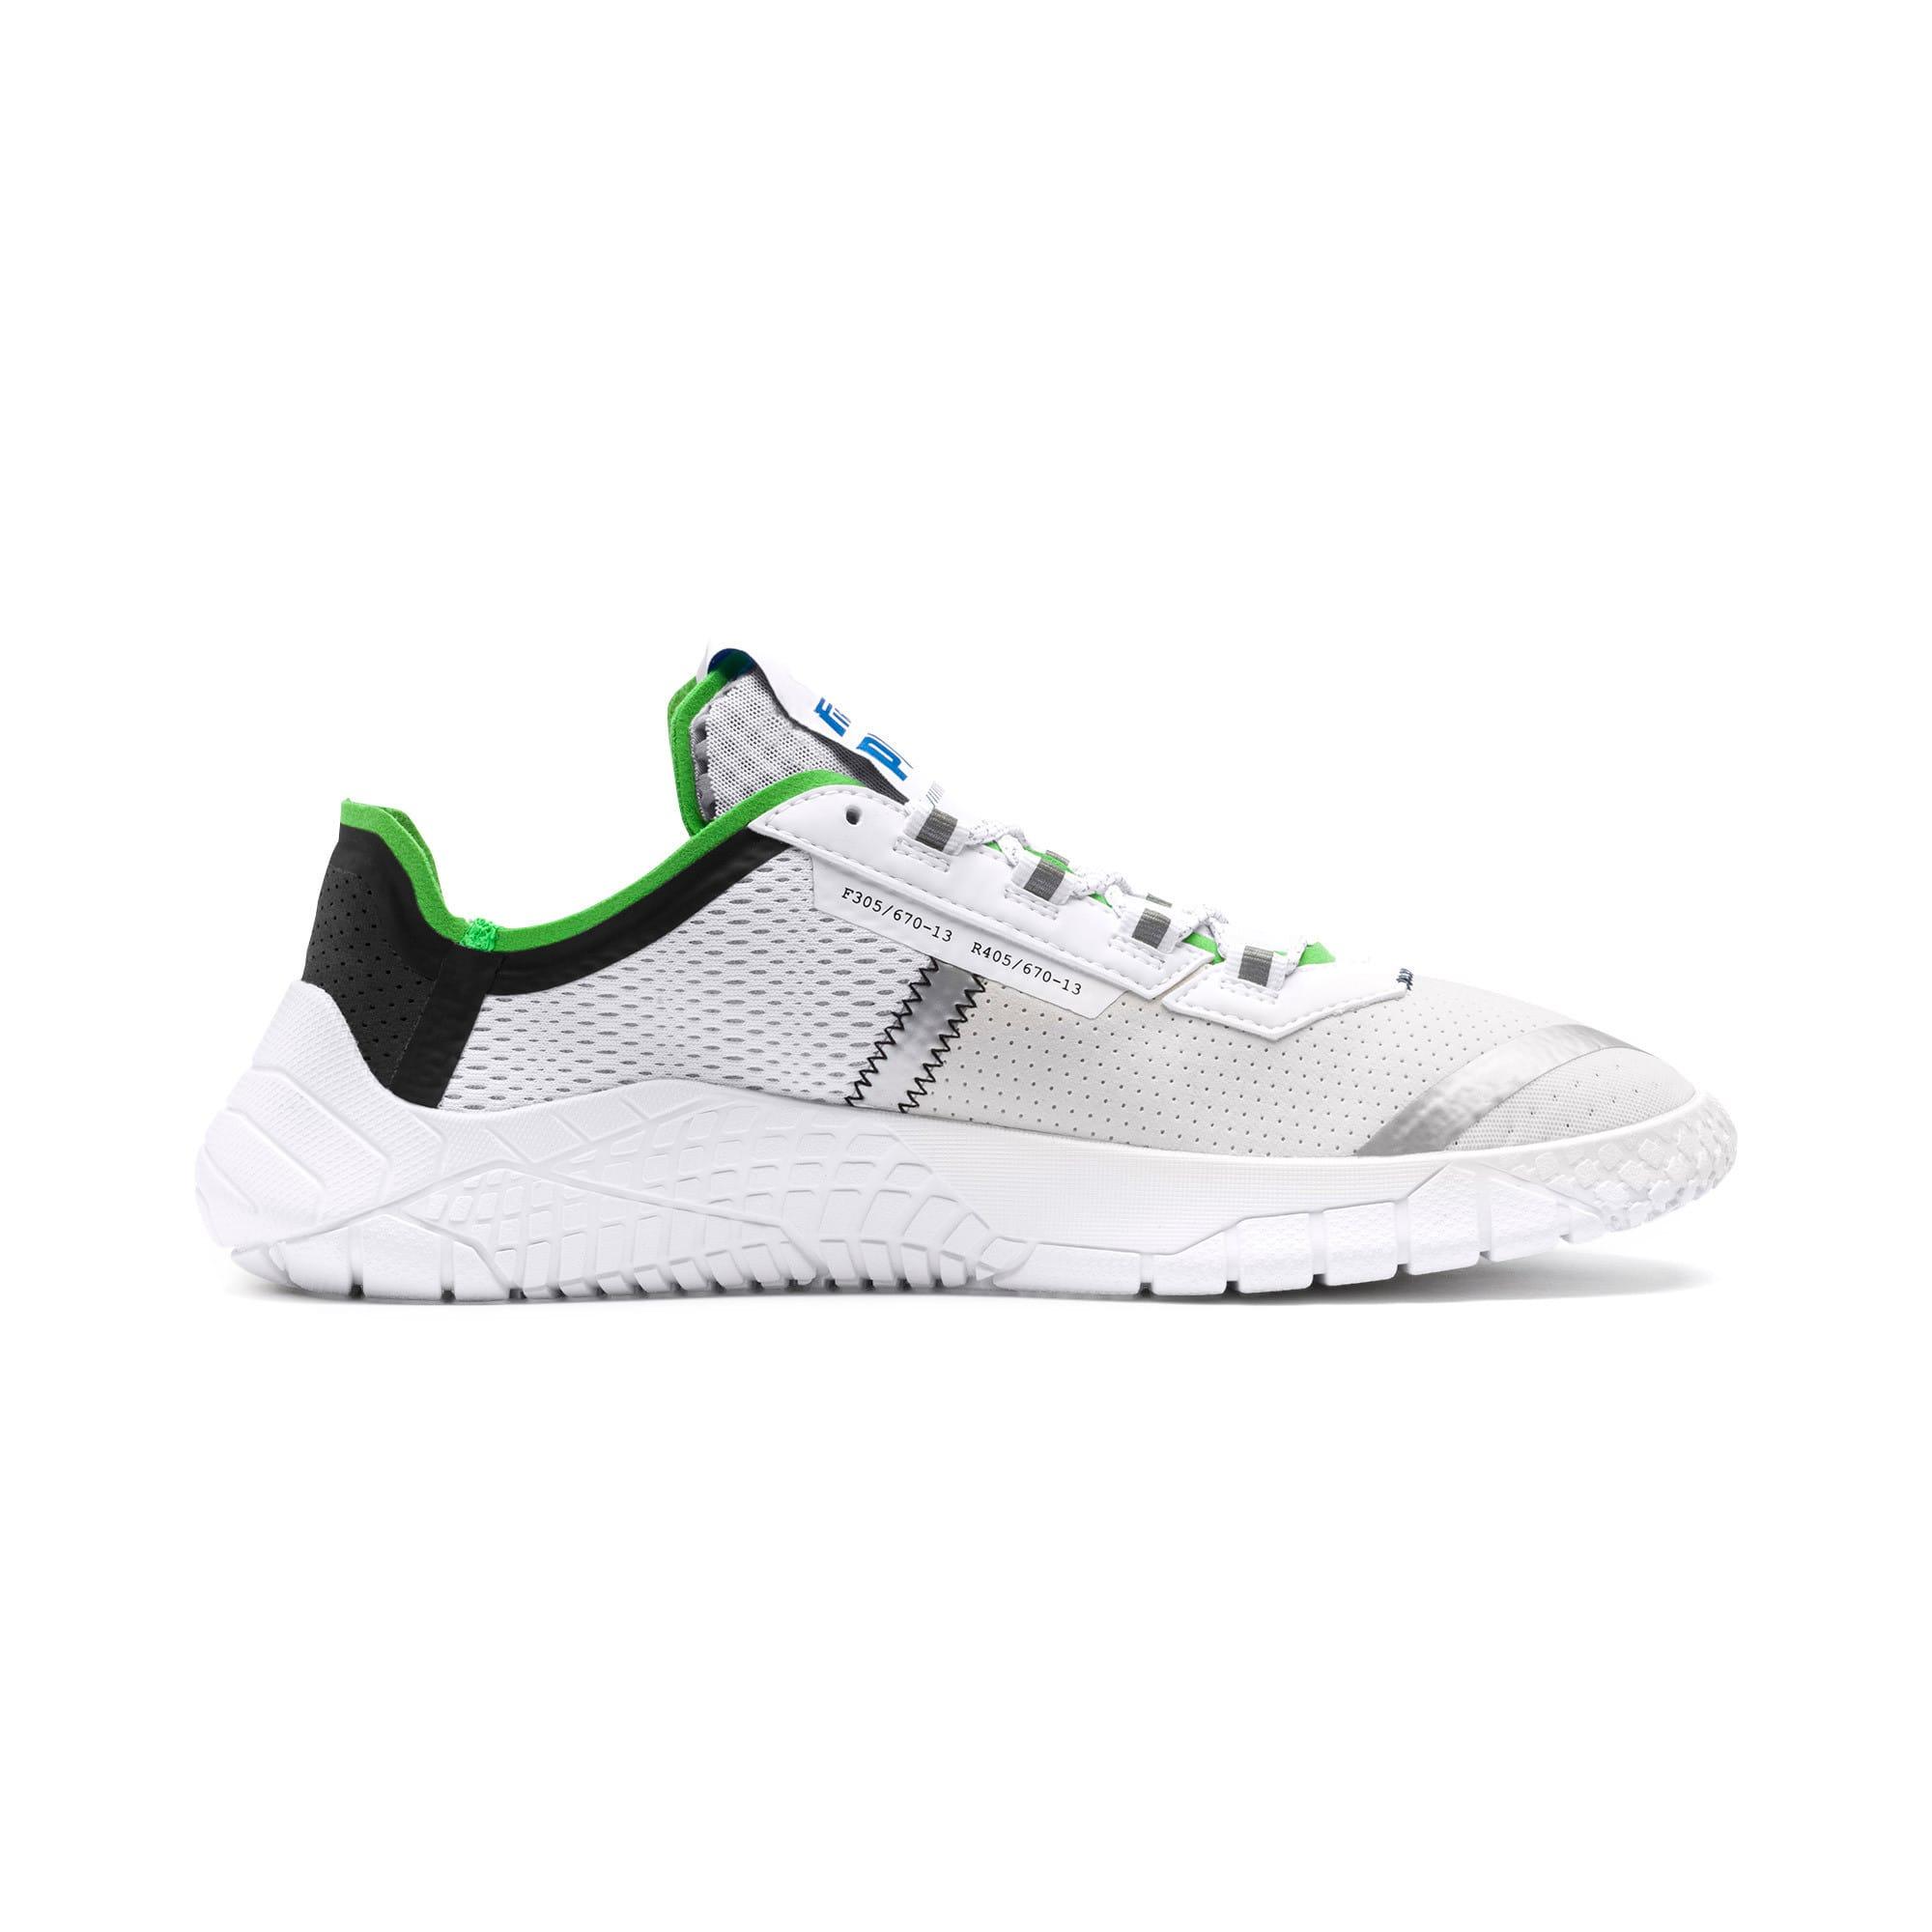 Thumbnail 6 of Replicat-X Pirelli Motorsport Shoes, White-Black-Classic Green, medium